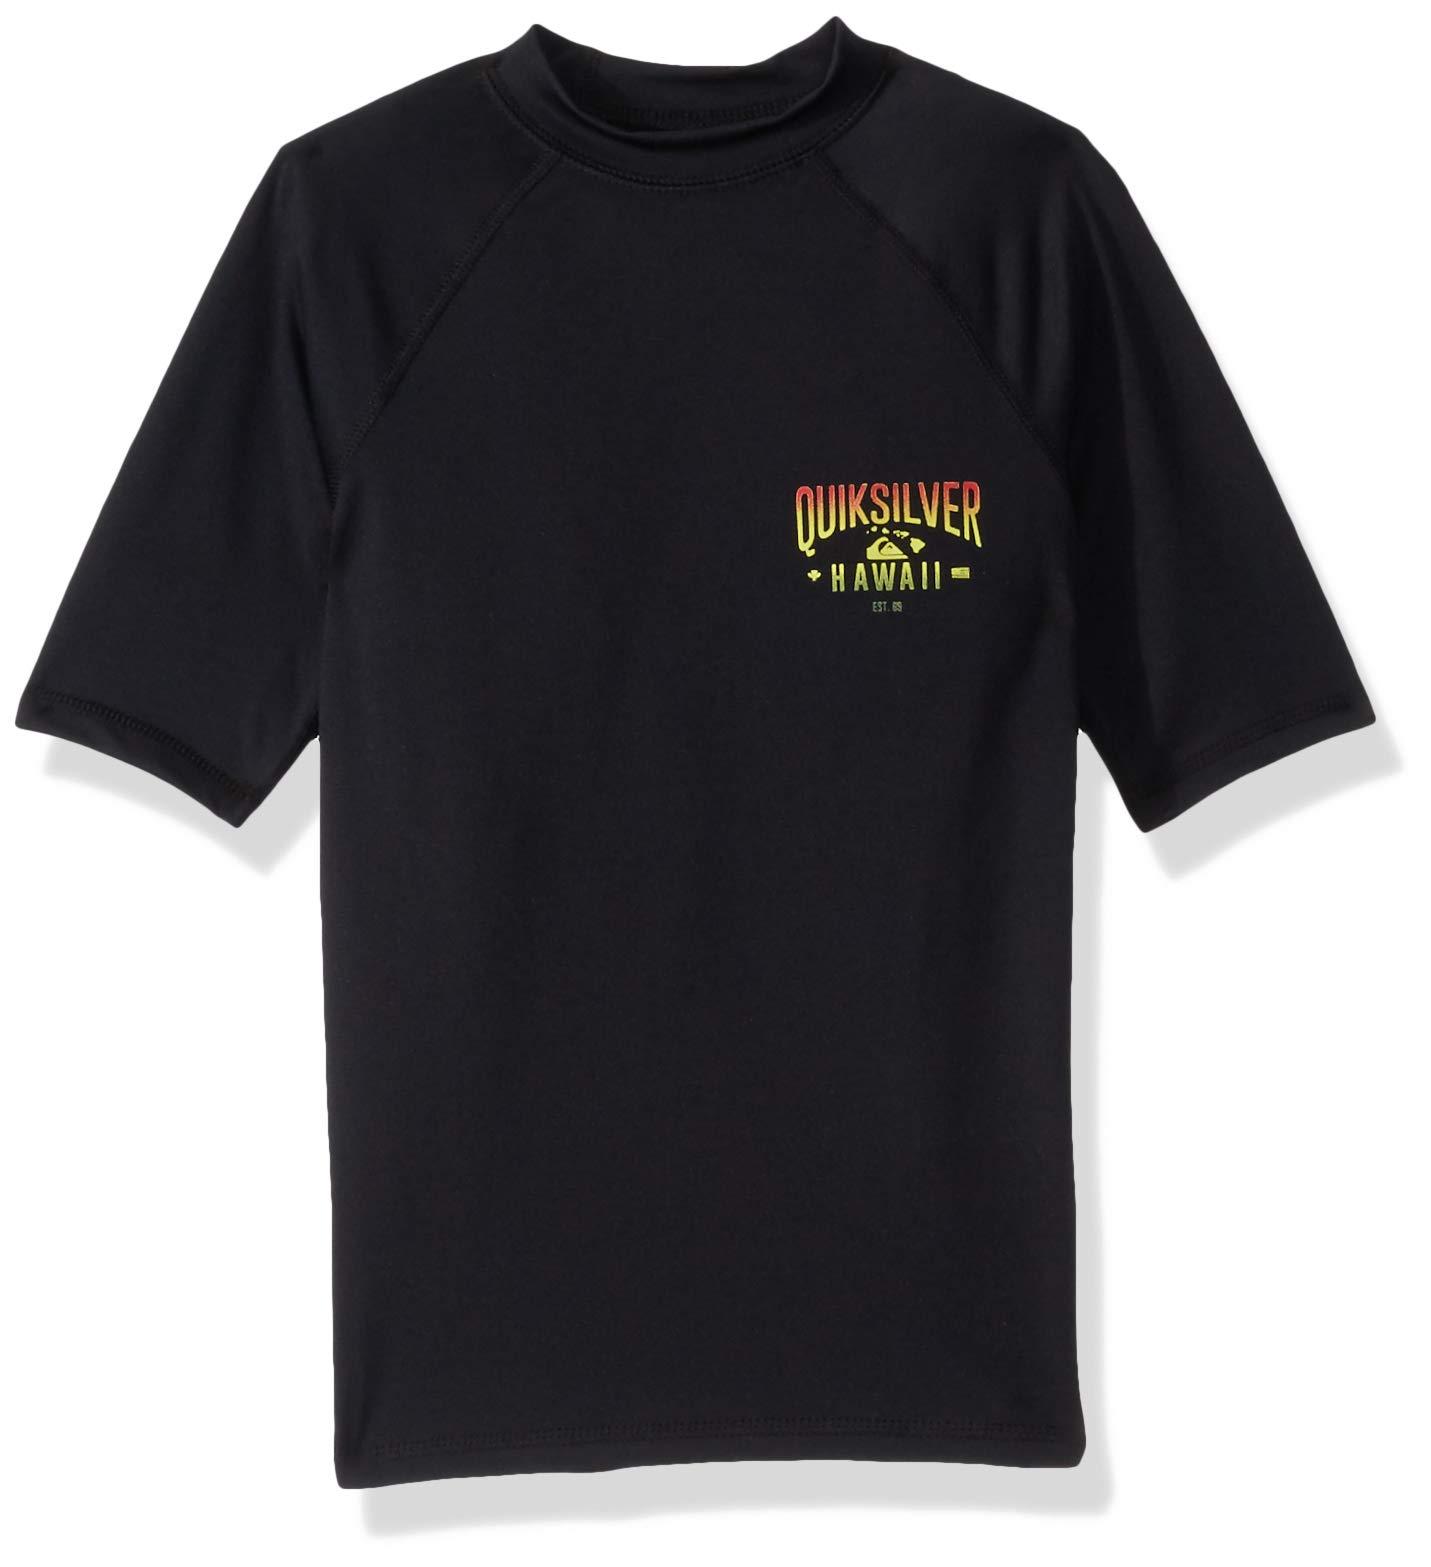 QUIKSILVER Boys Big Kona Way Short Sleeve Youth UPF 50 Sun Protection